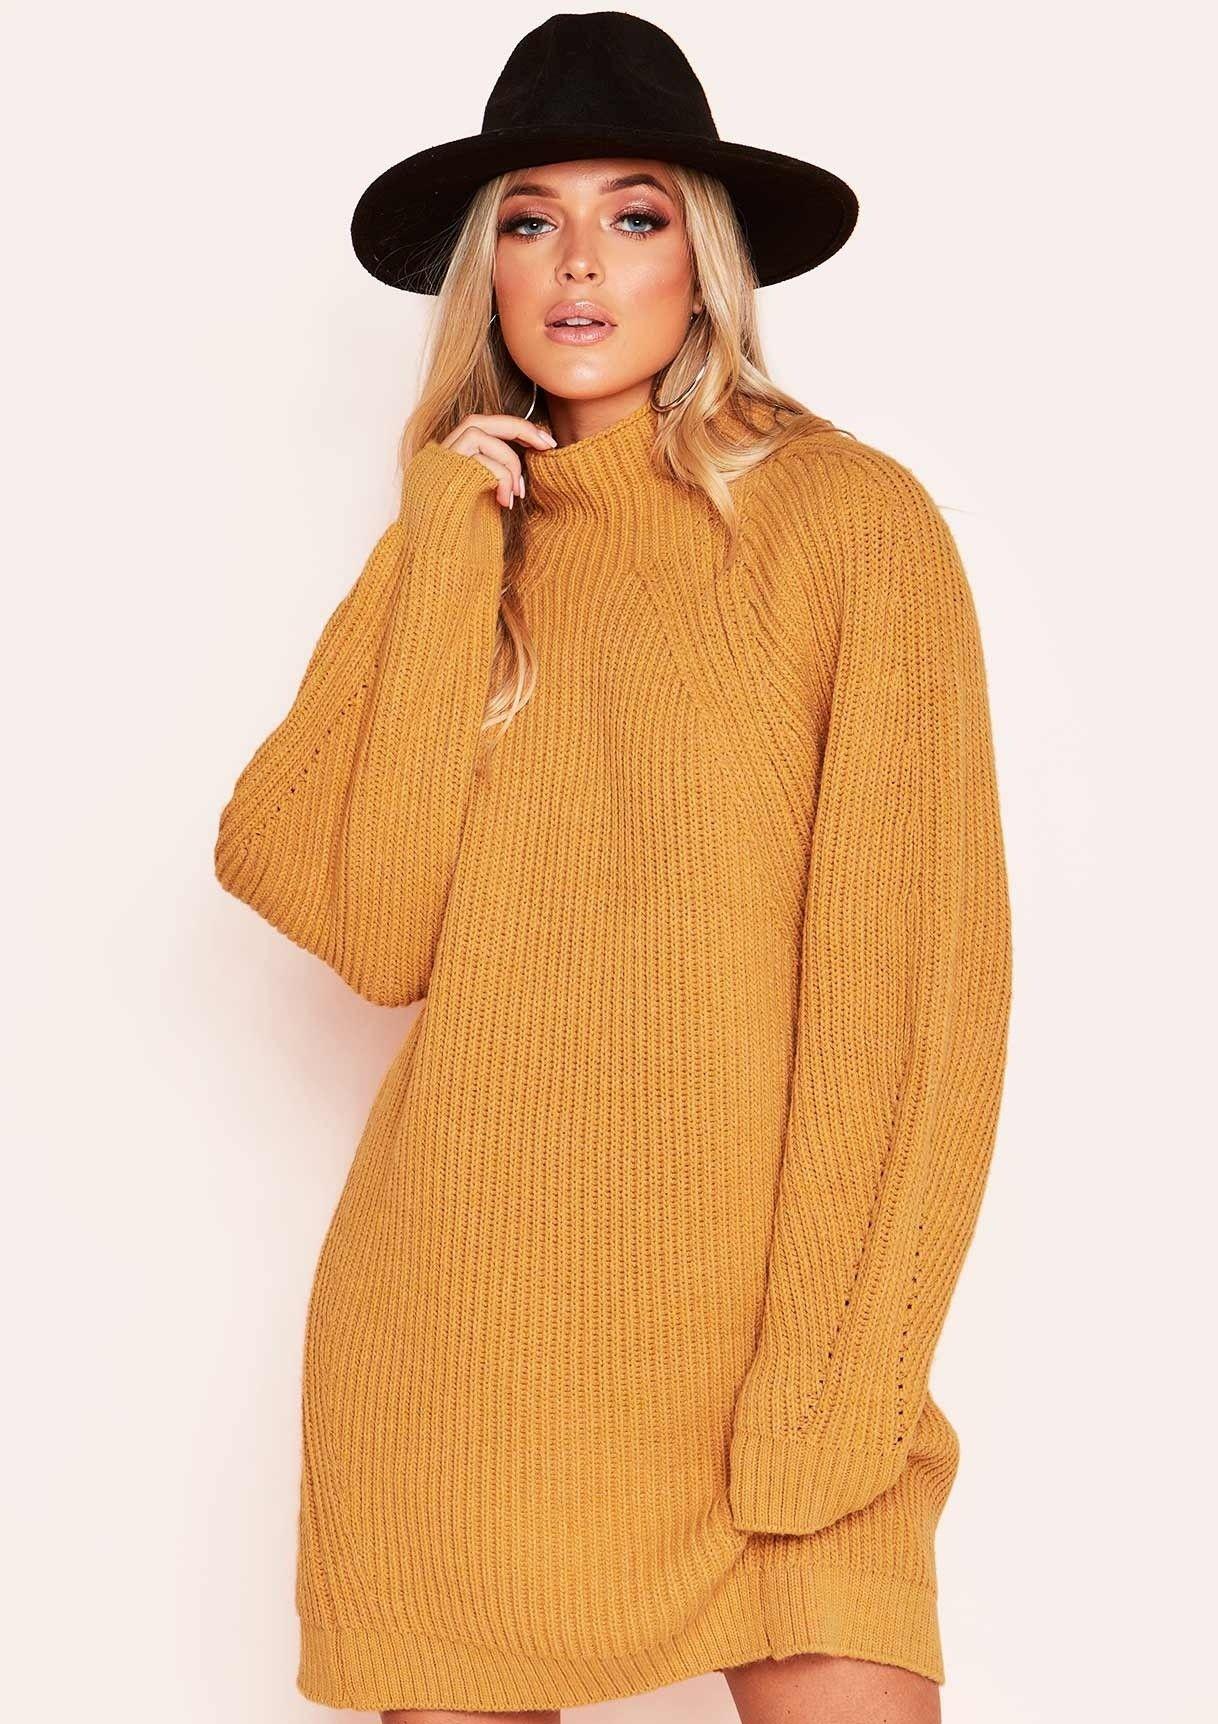 Amie Mustard Chunky Knit Jumper Dress #chunkyknitjumper